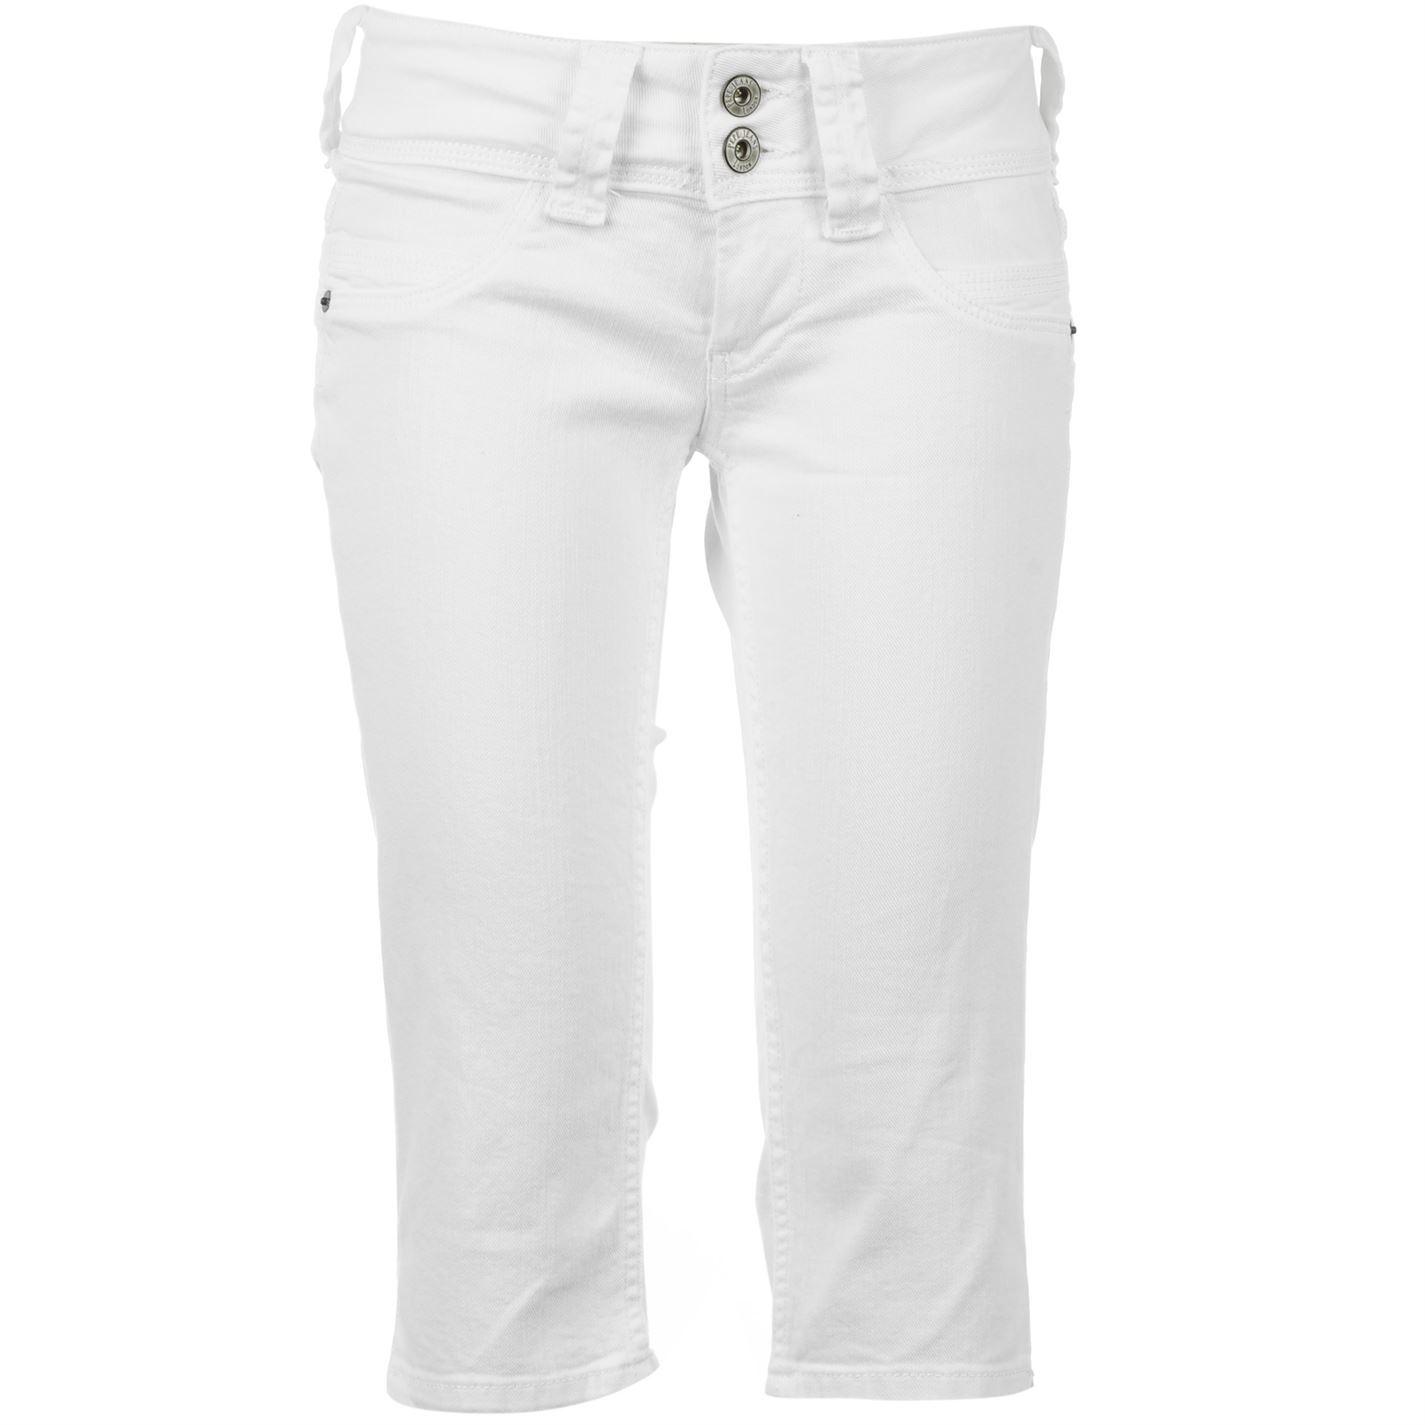 pepe jeans venus bermuda shorts casual bottoms ladies ebay. Black Bedroom Furniture Sets. Home Design Ideas